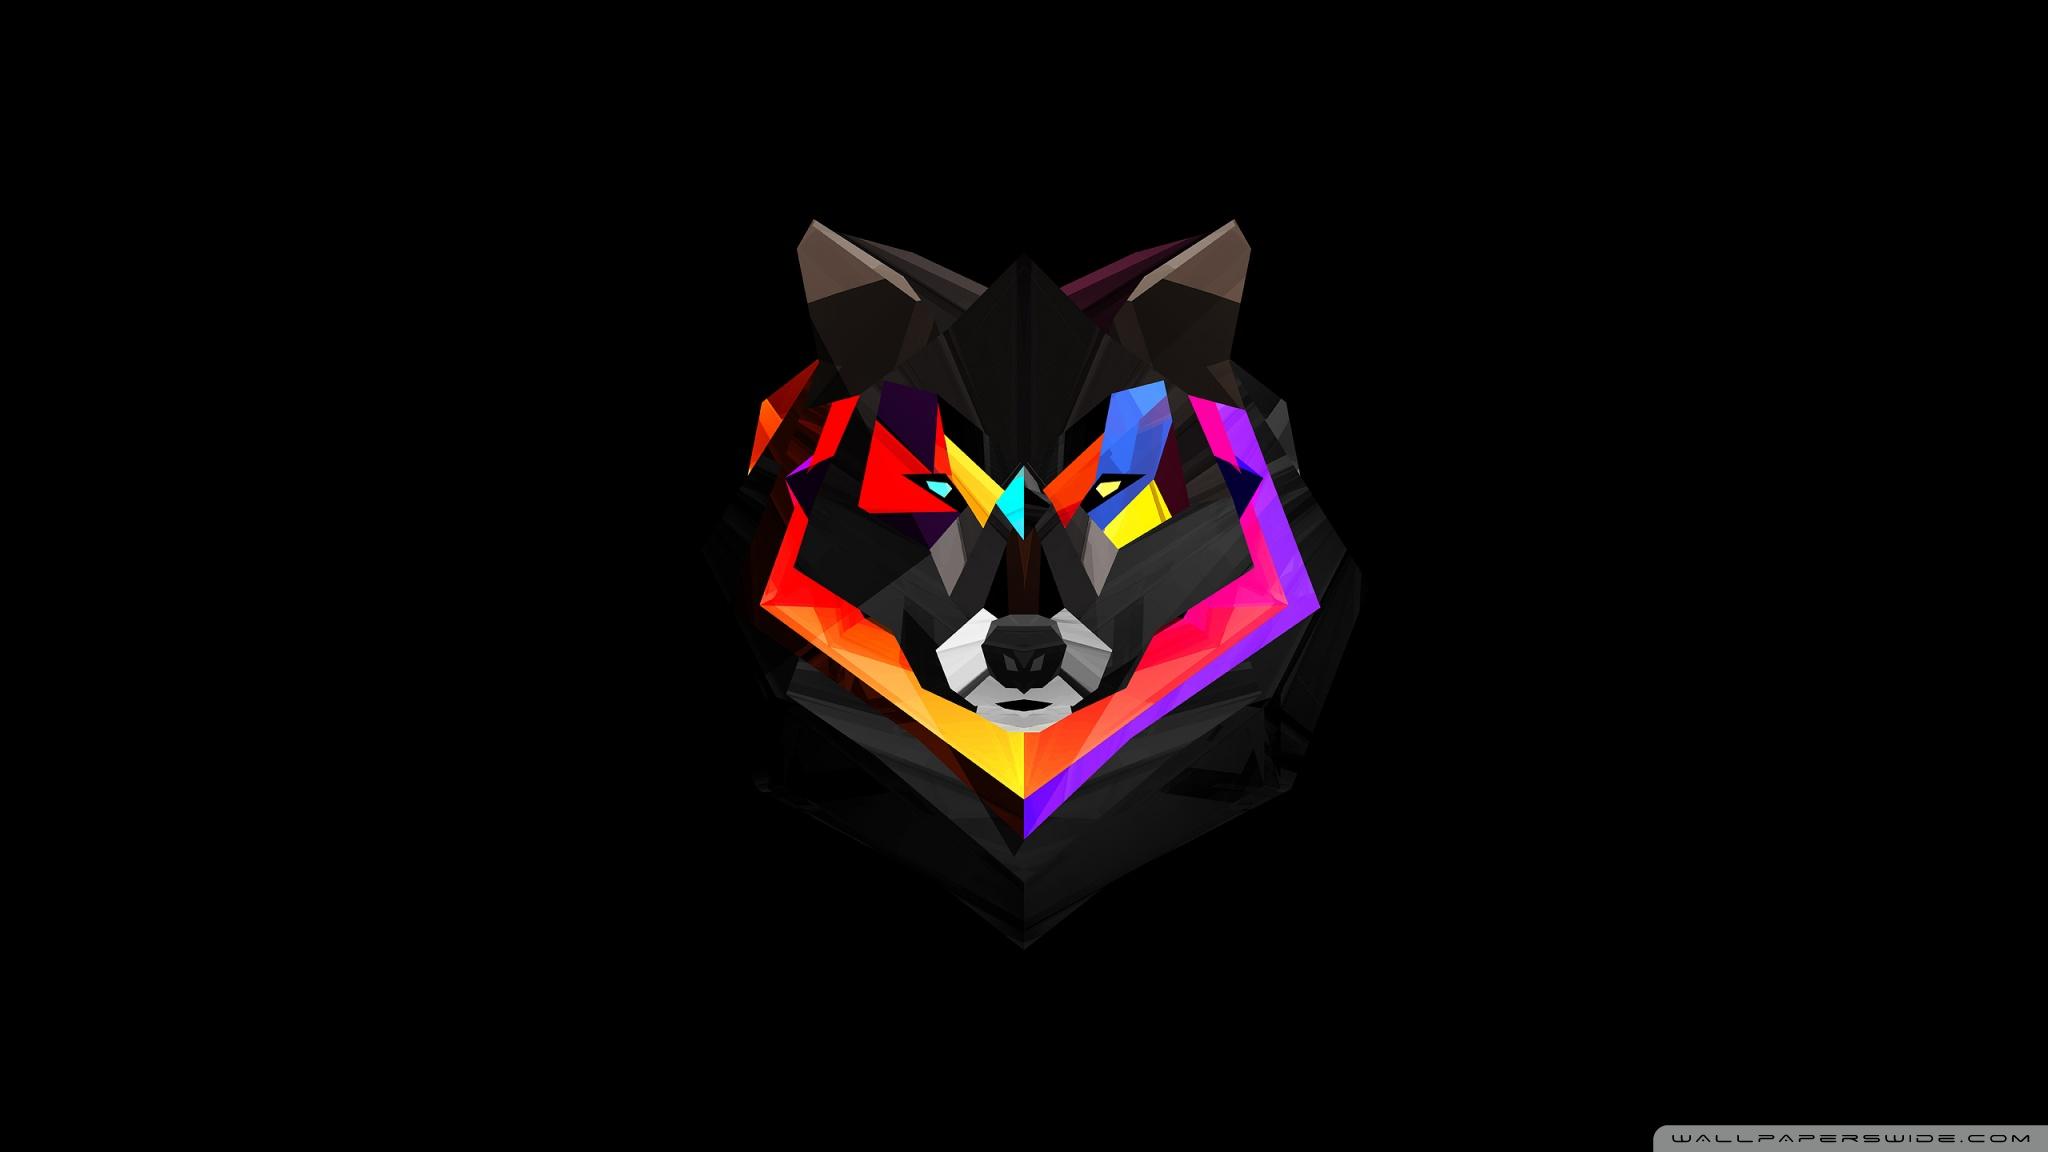 Wolf Hd Wallpaper Background Image 2048x1152 Id949397